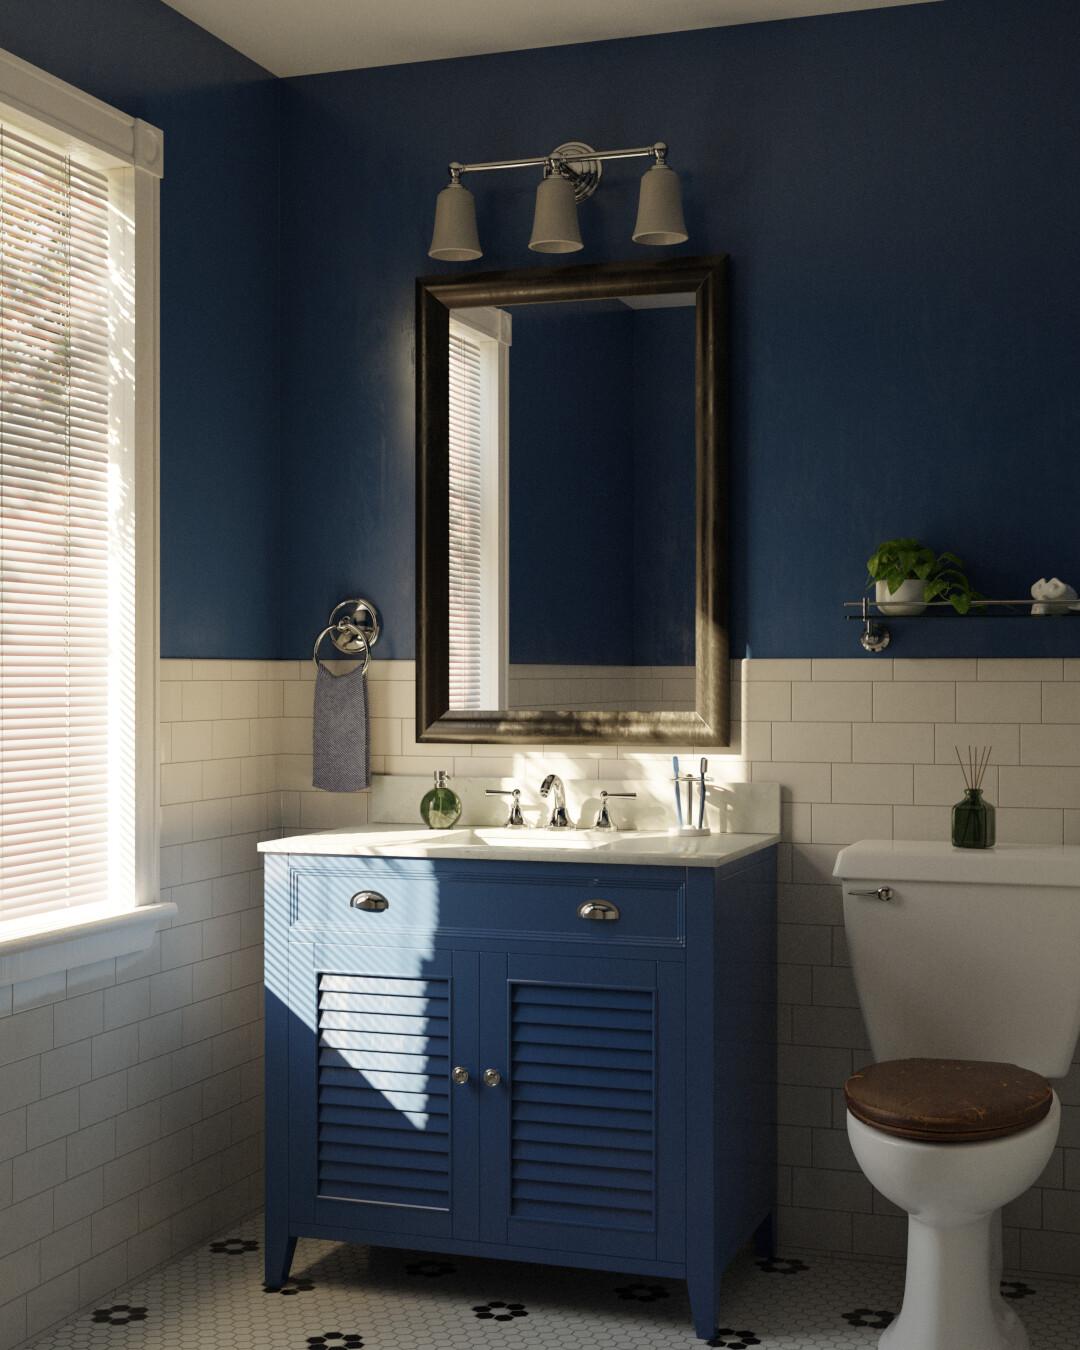 Blue Bathroom in Natural Light